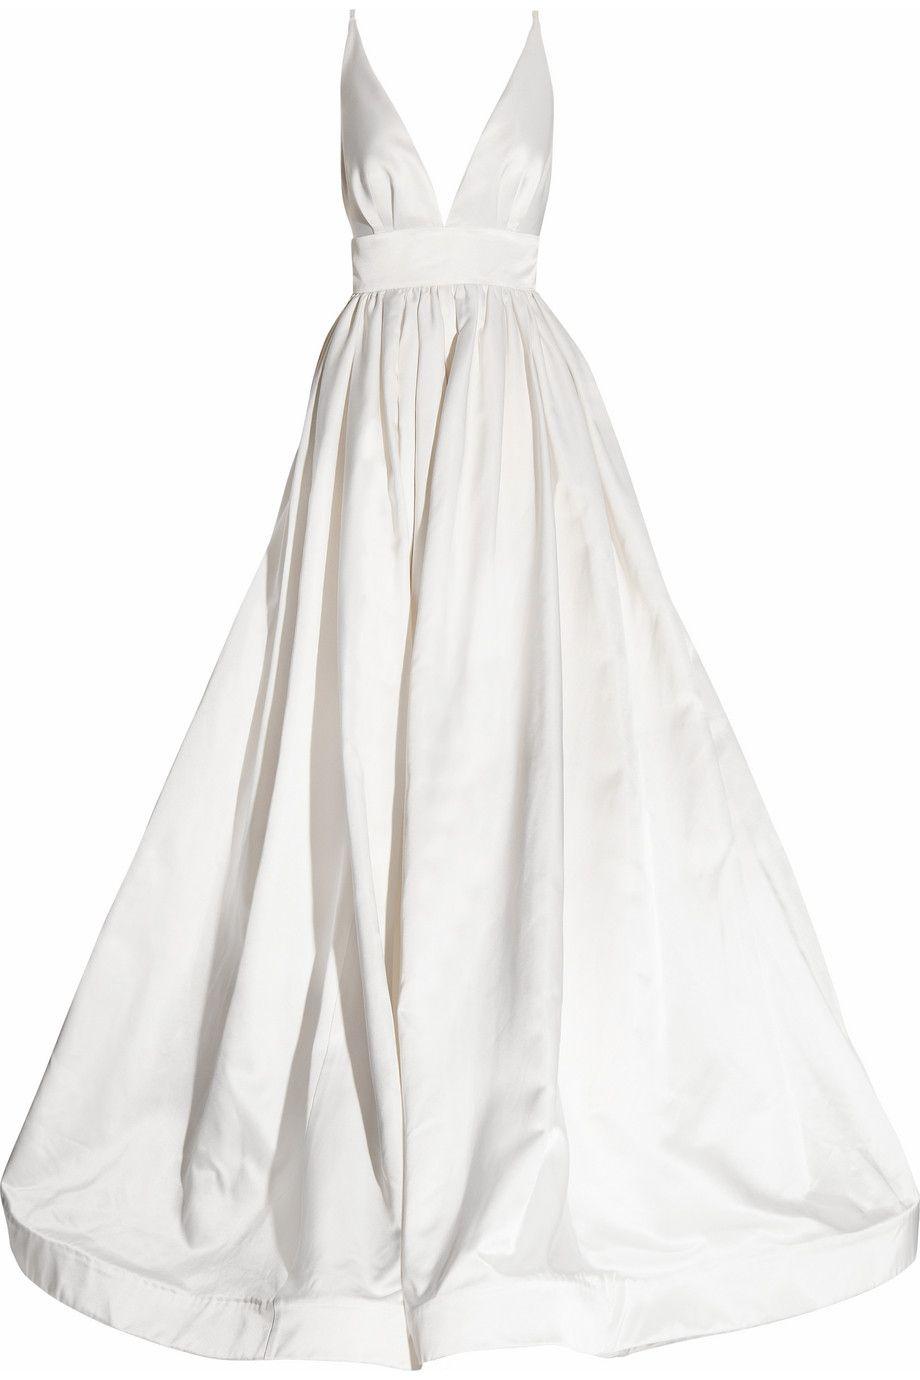 The princess bride princess wedding gowns and princess